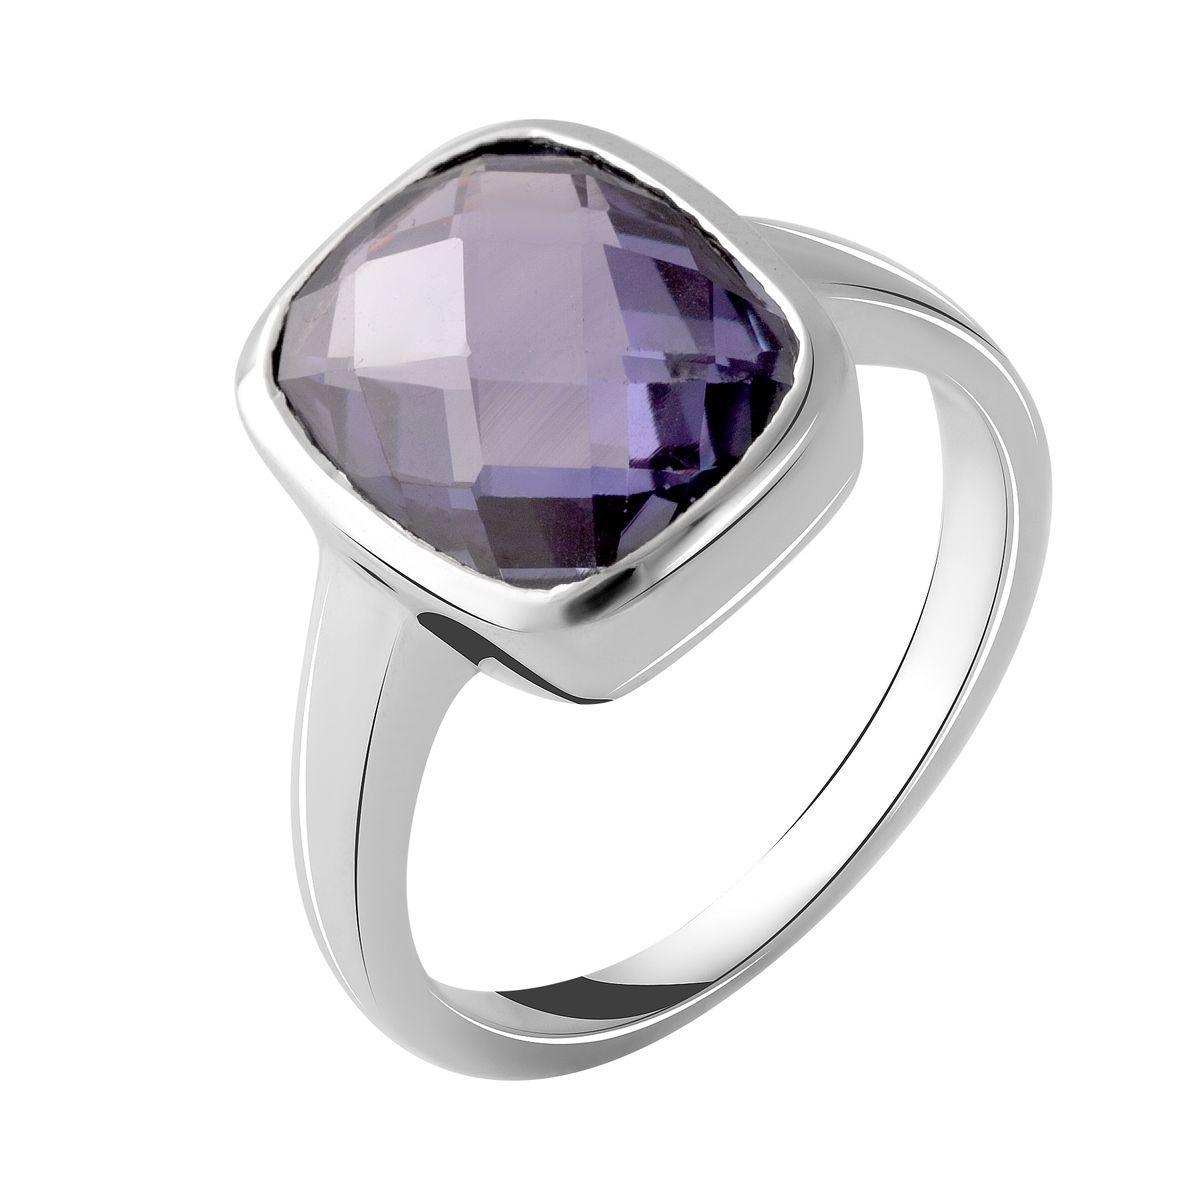 Серебряное кольцо DreamJewelry с олександритом 7.688ct (2050292) 18 размер